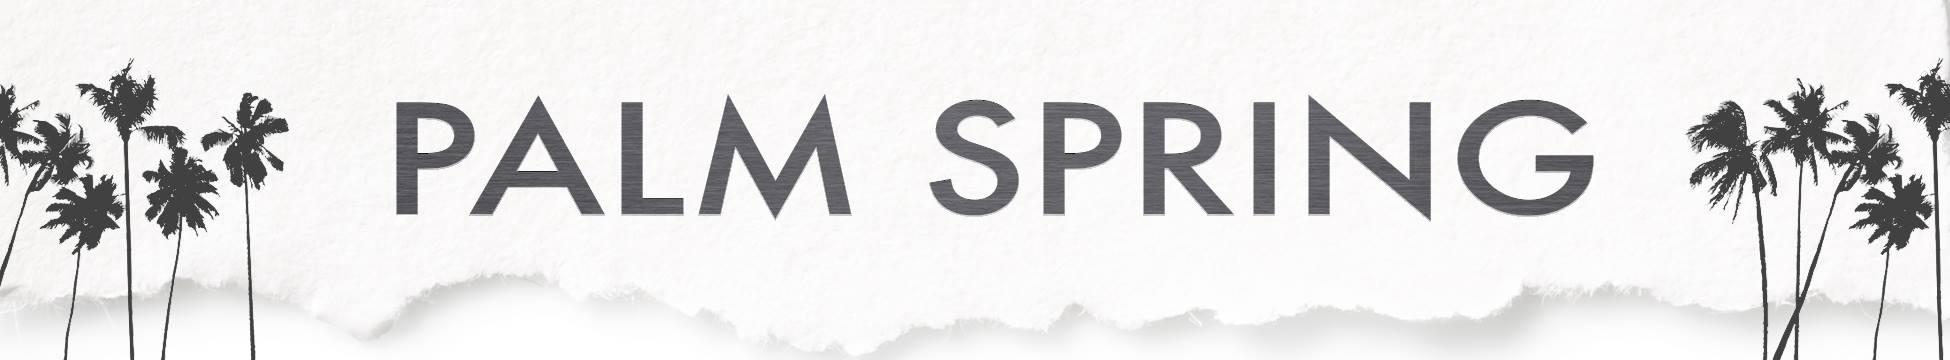 PALM SPRING (@palmspringvapor) Cover Image